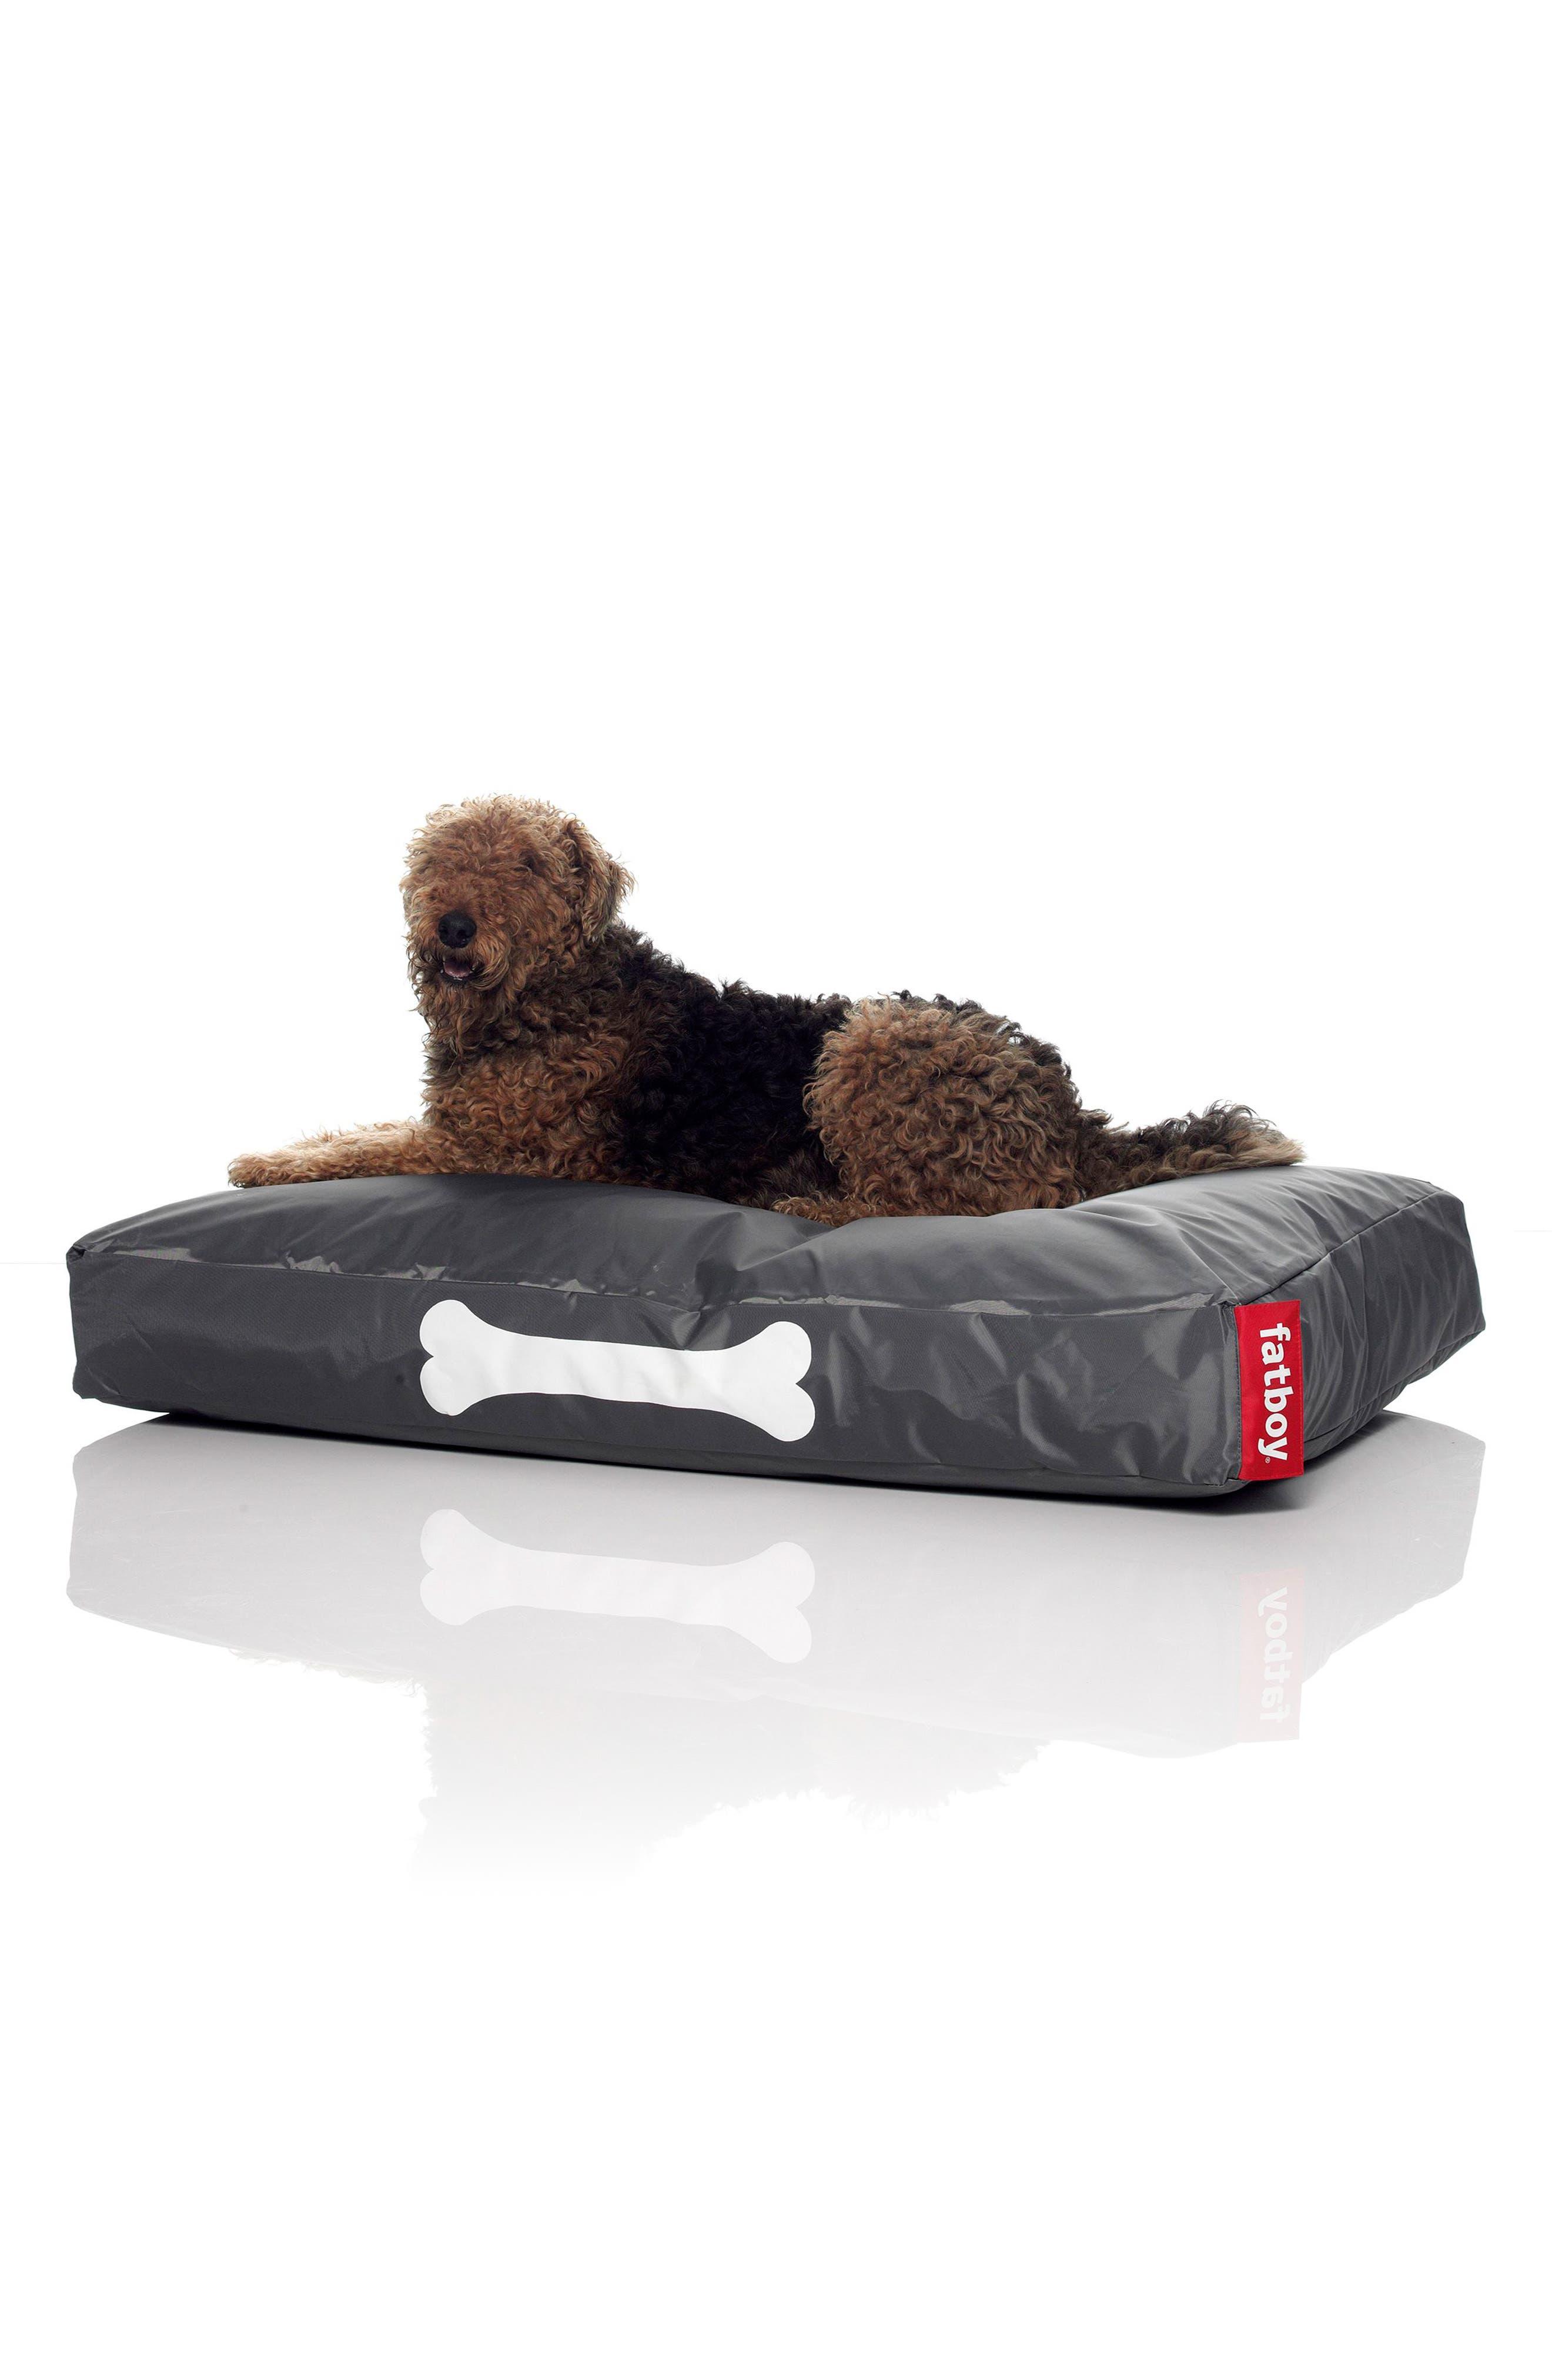 Doggielounge Pet Bed,                             Alternate thumbnail 2, color,                             Dark Grey